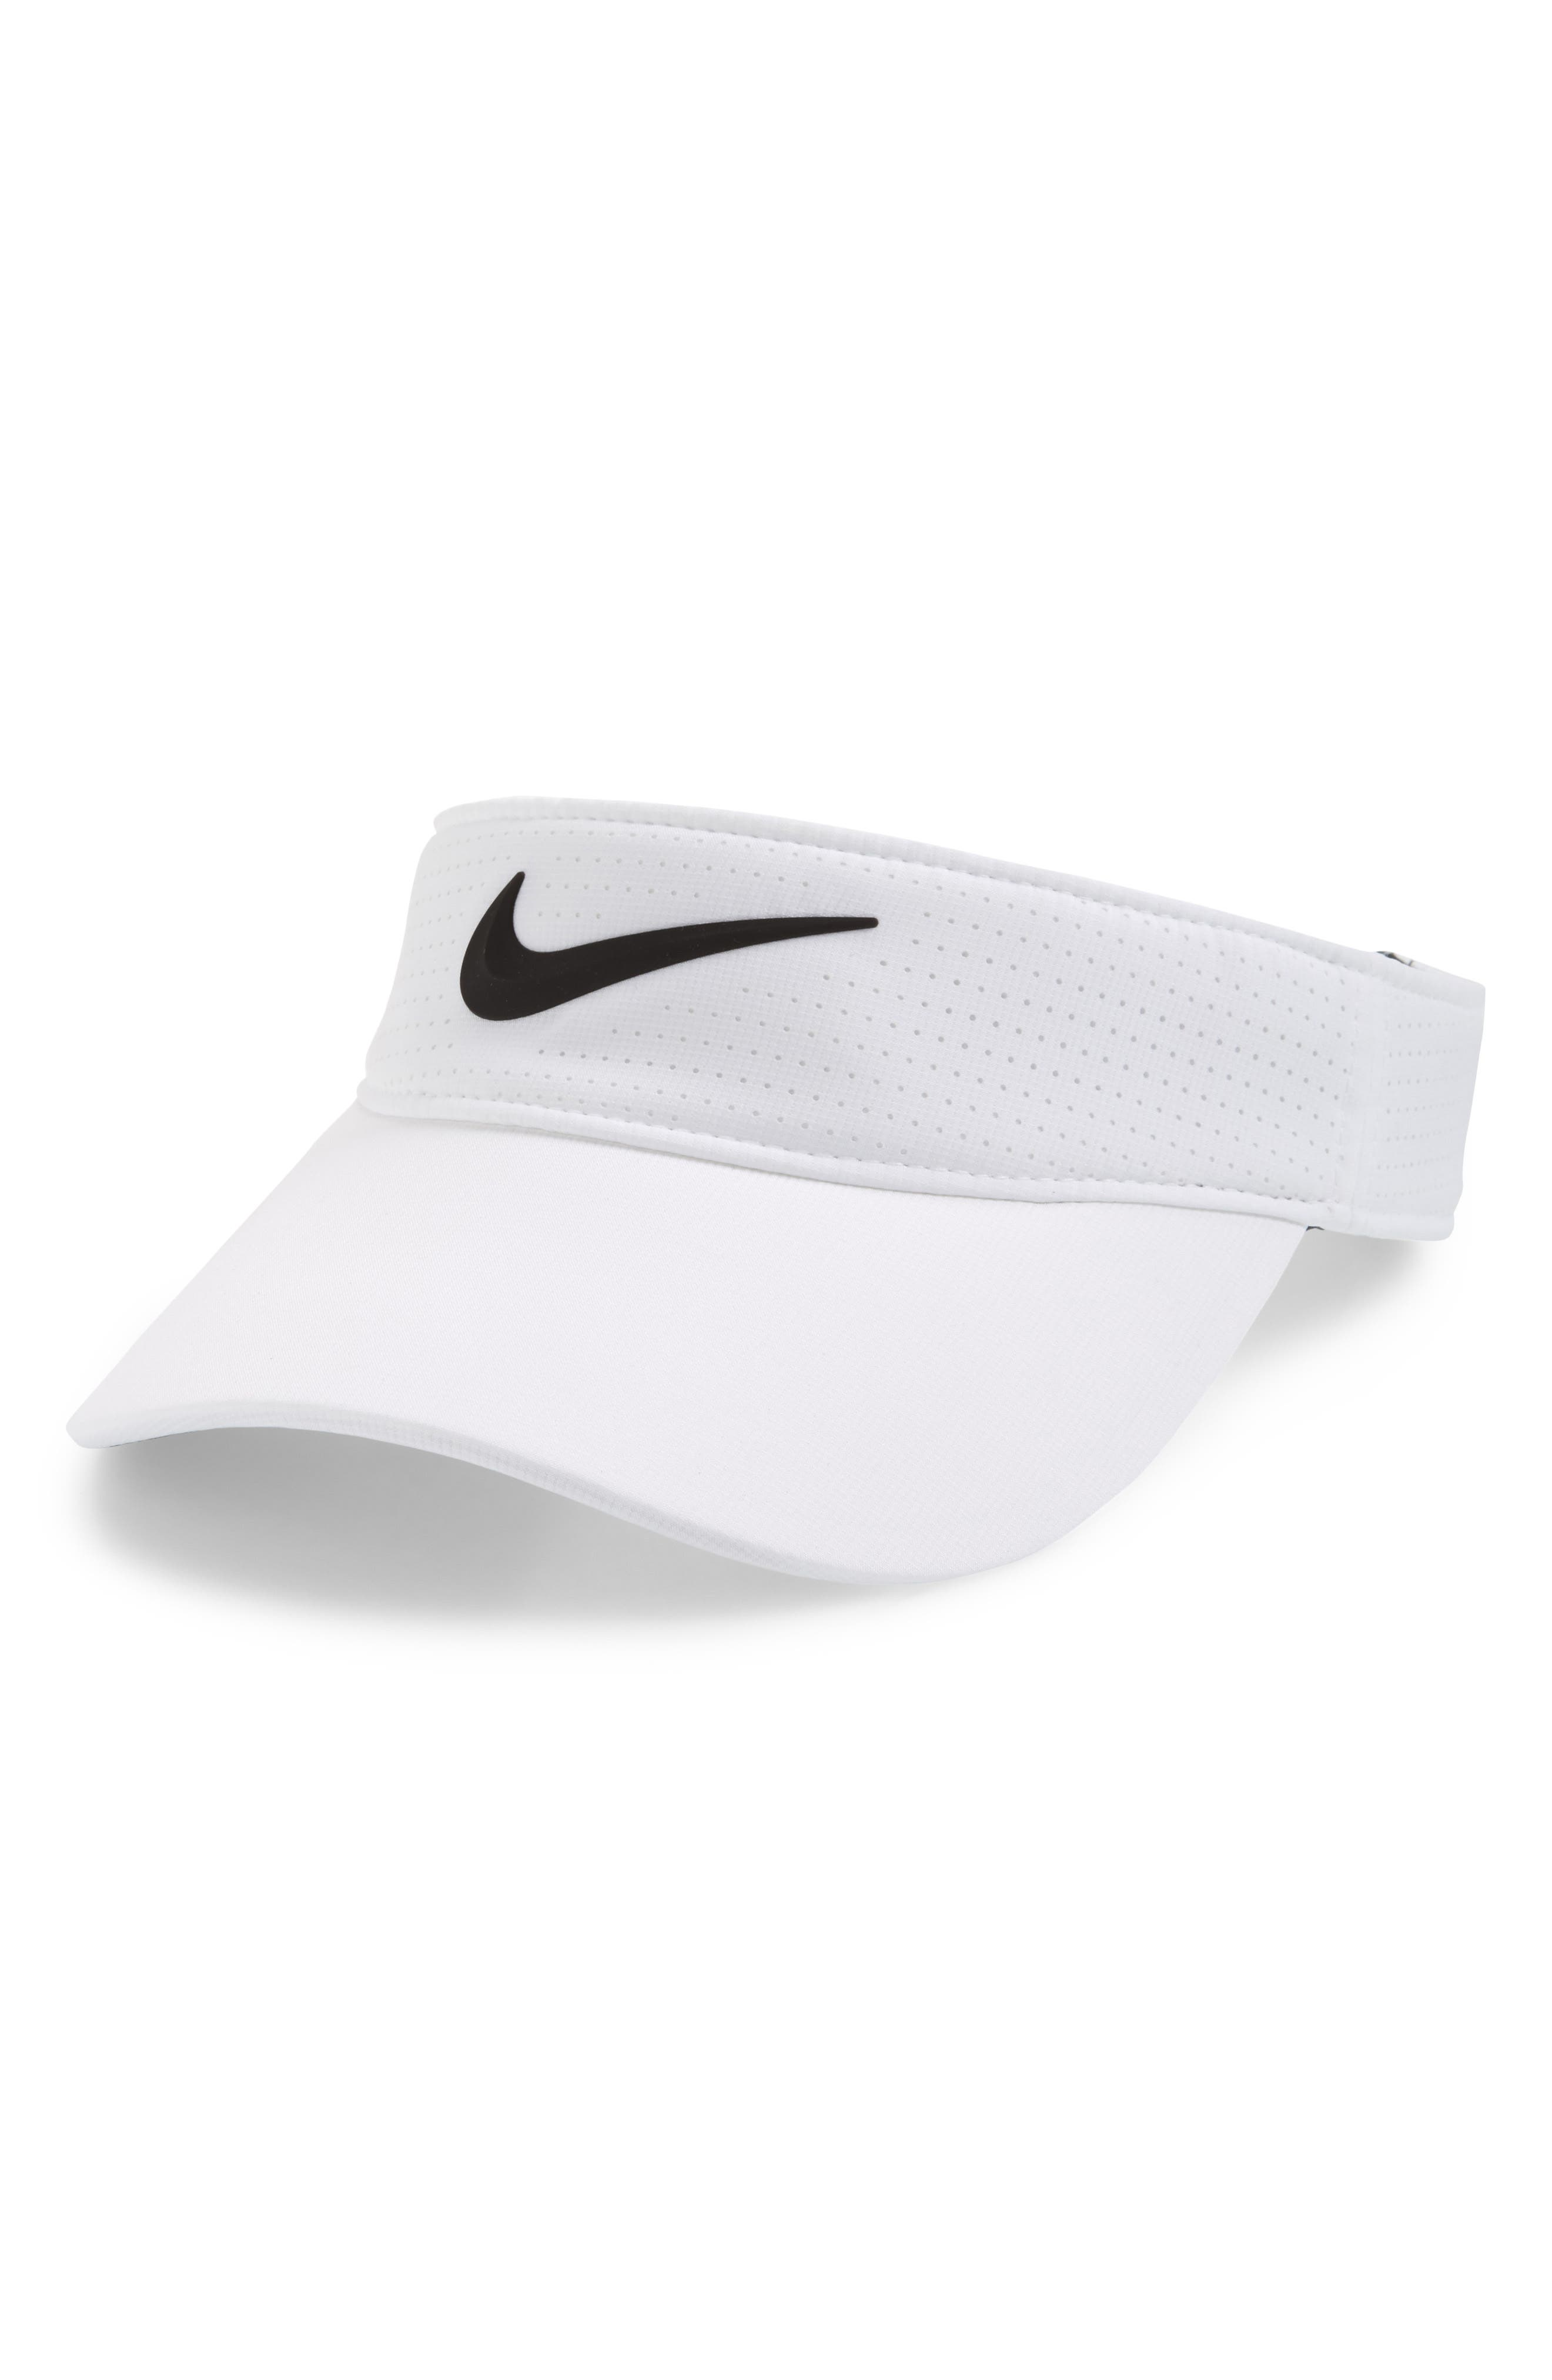 Aerobill Golf Visor,                             Main thumbnail 1, color,                             White/ Anthracite/ Black